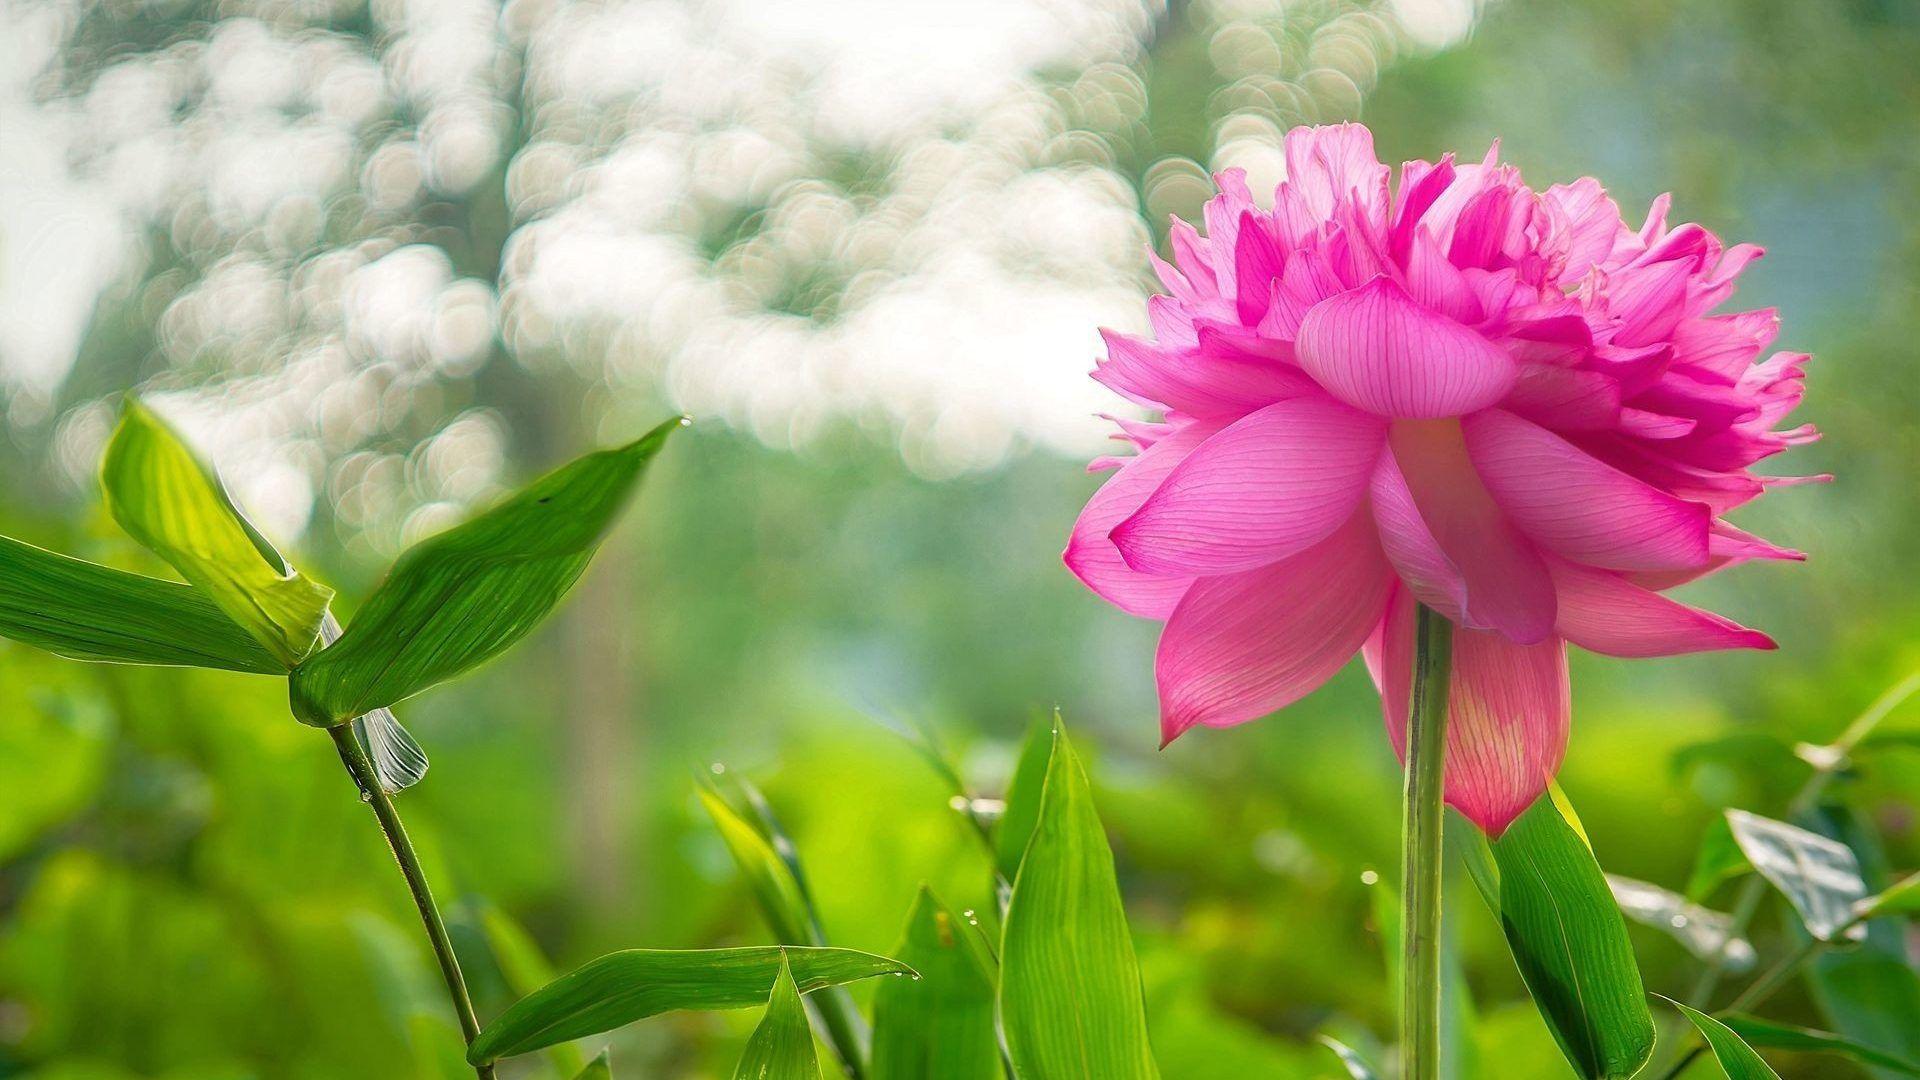 Flowers Lovely Lotus Nature Pink Flower Wallpaper For Windows 7 Free